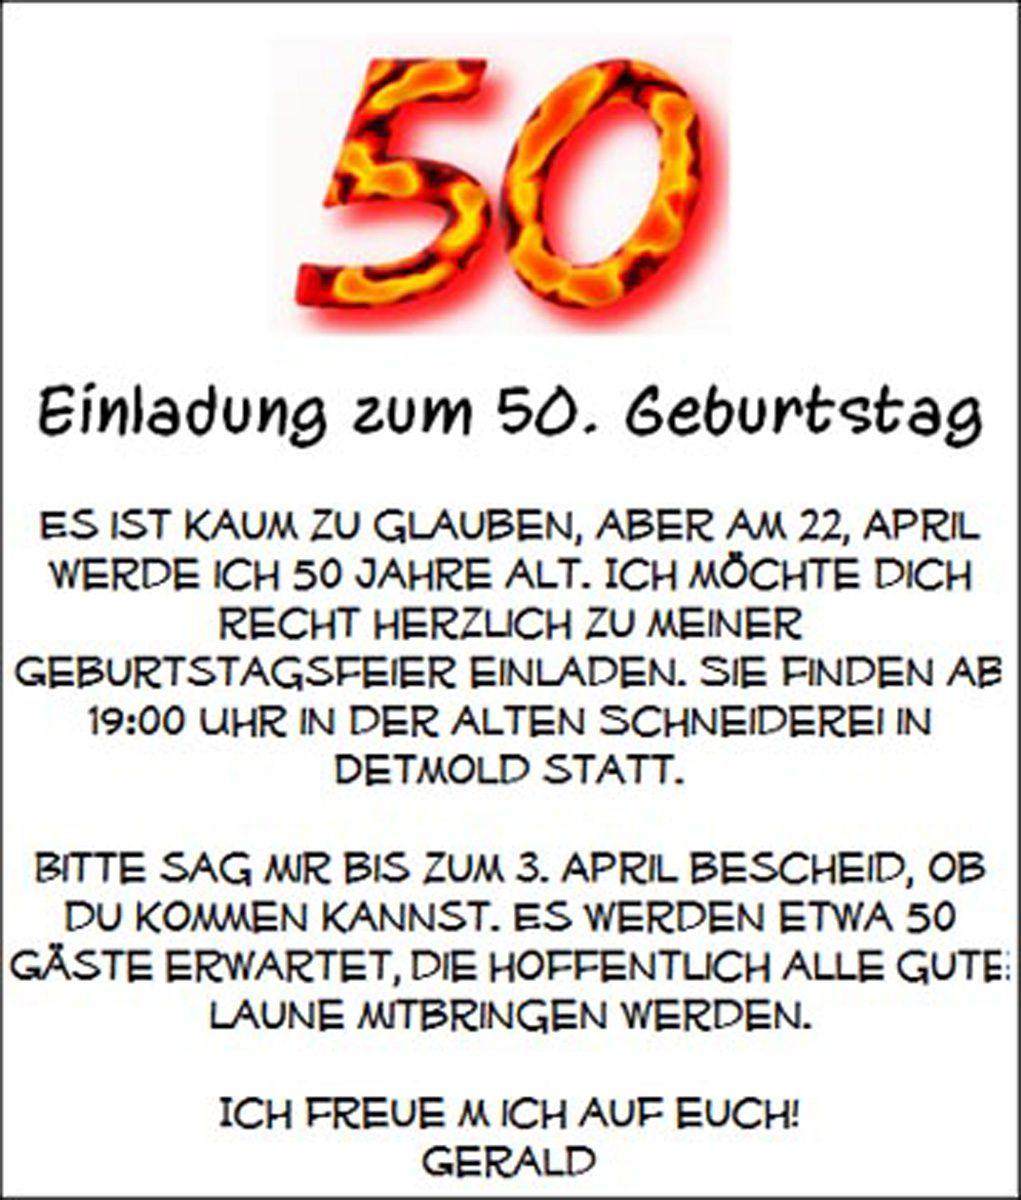 Einladung Zum 46 Geburtstag : Einladung Zum 46 Geburtstag Sprüche ... - Einladungskarten 60 Geburtstag Sprüche